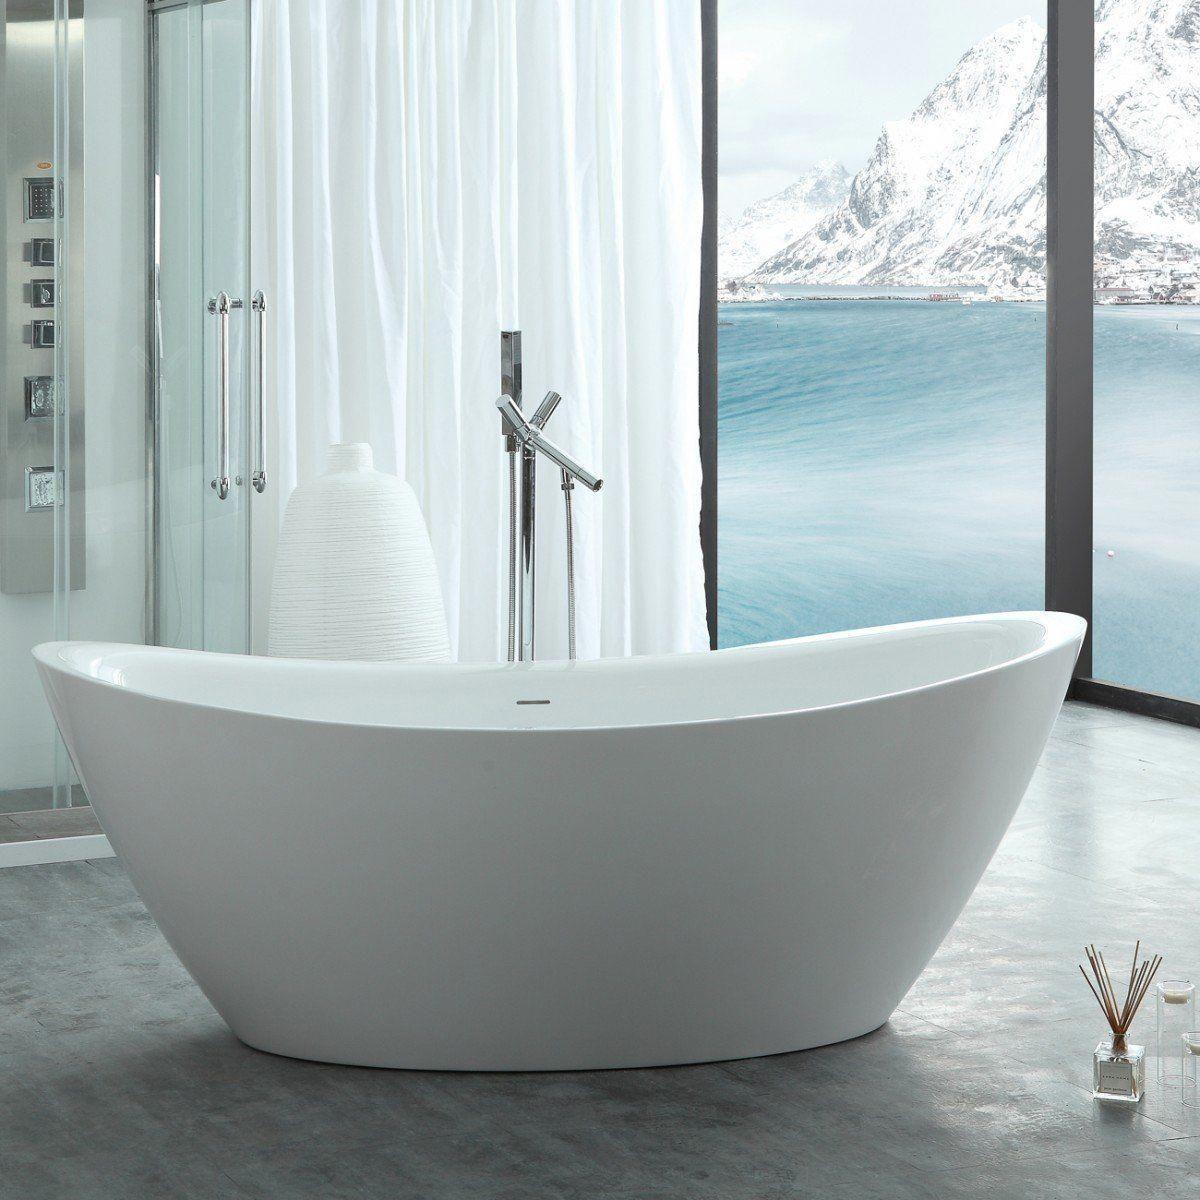 Gloria 71 Inch Acrylic Double Slipper Freestanding Tub No Faucet